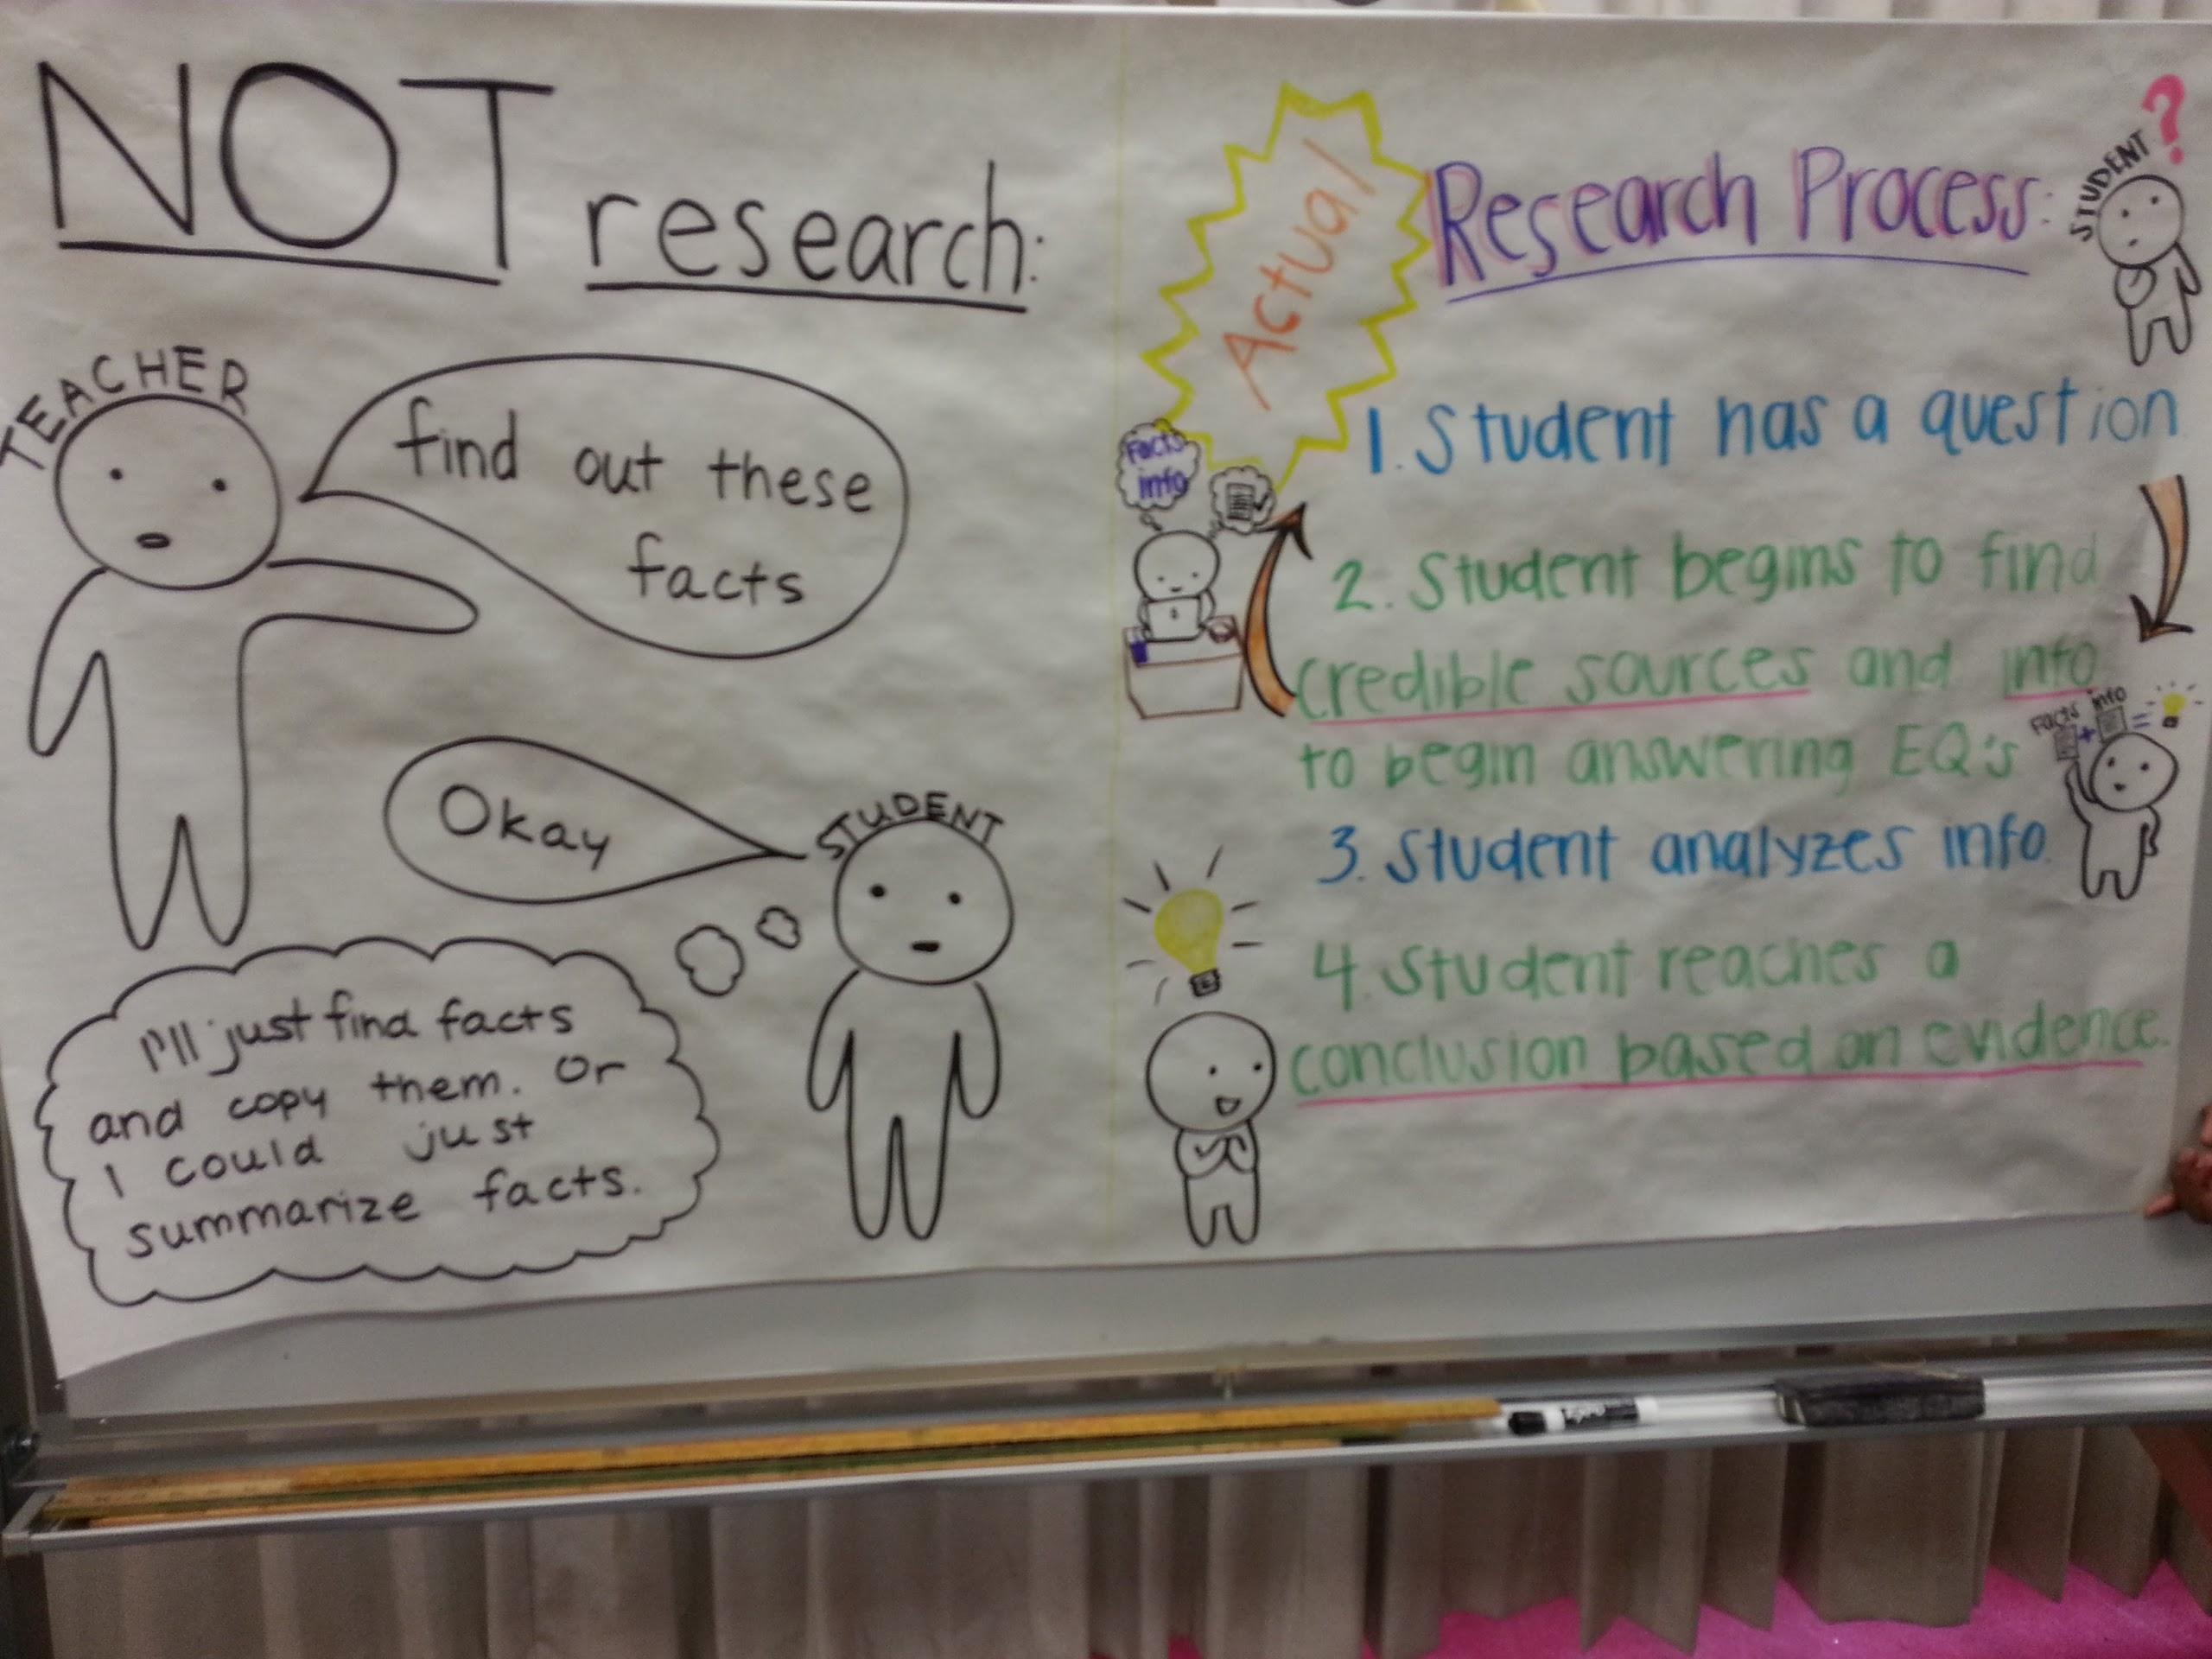 Oremland reesearch process. Credit: Leann Skallenud